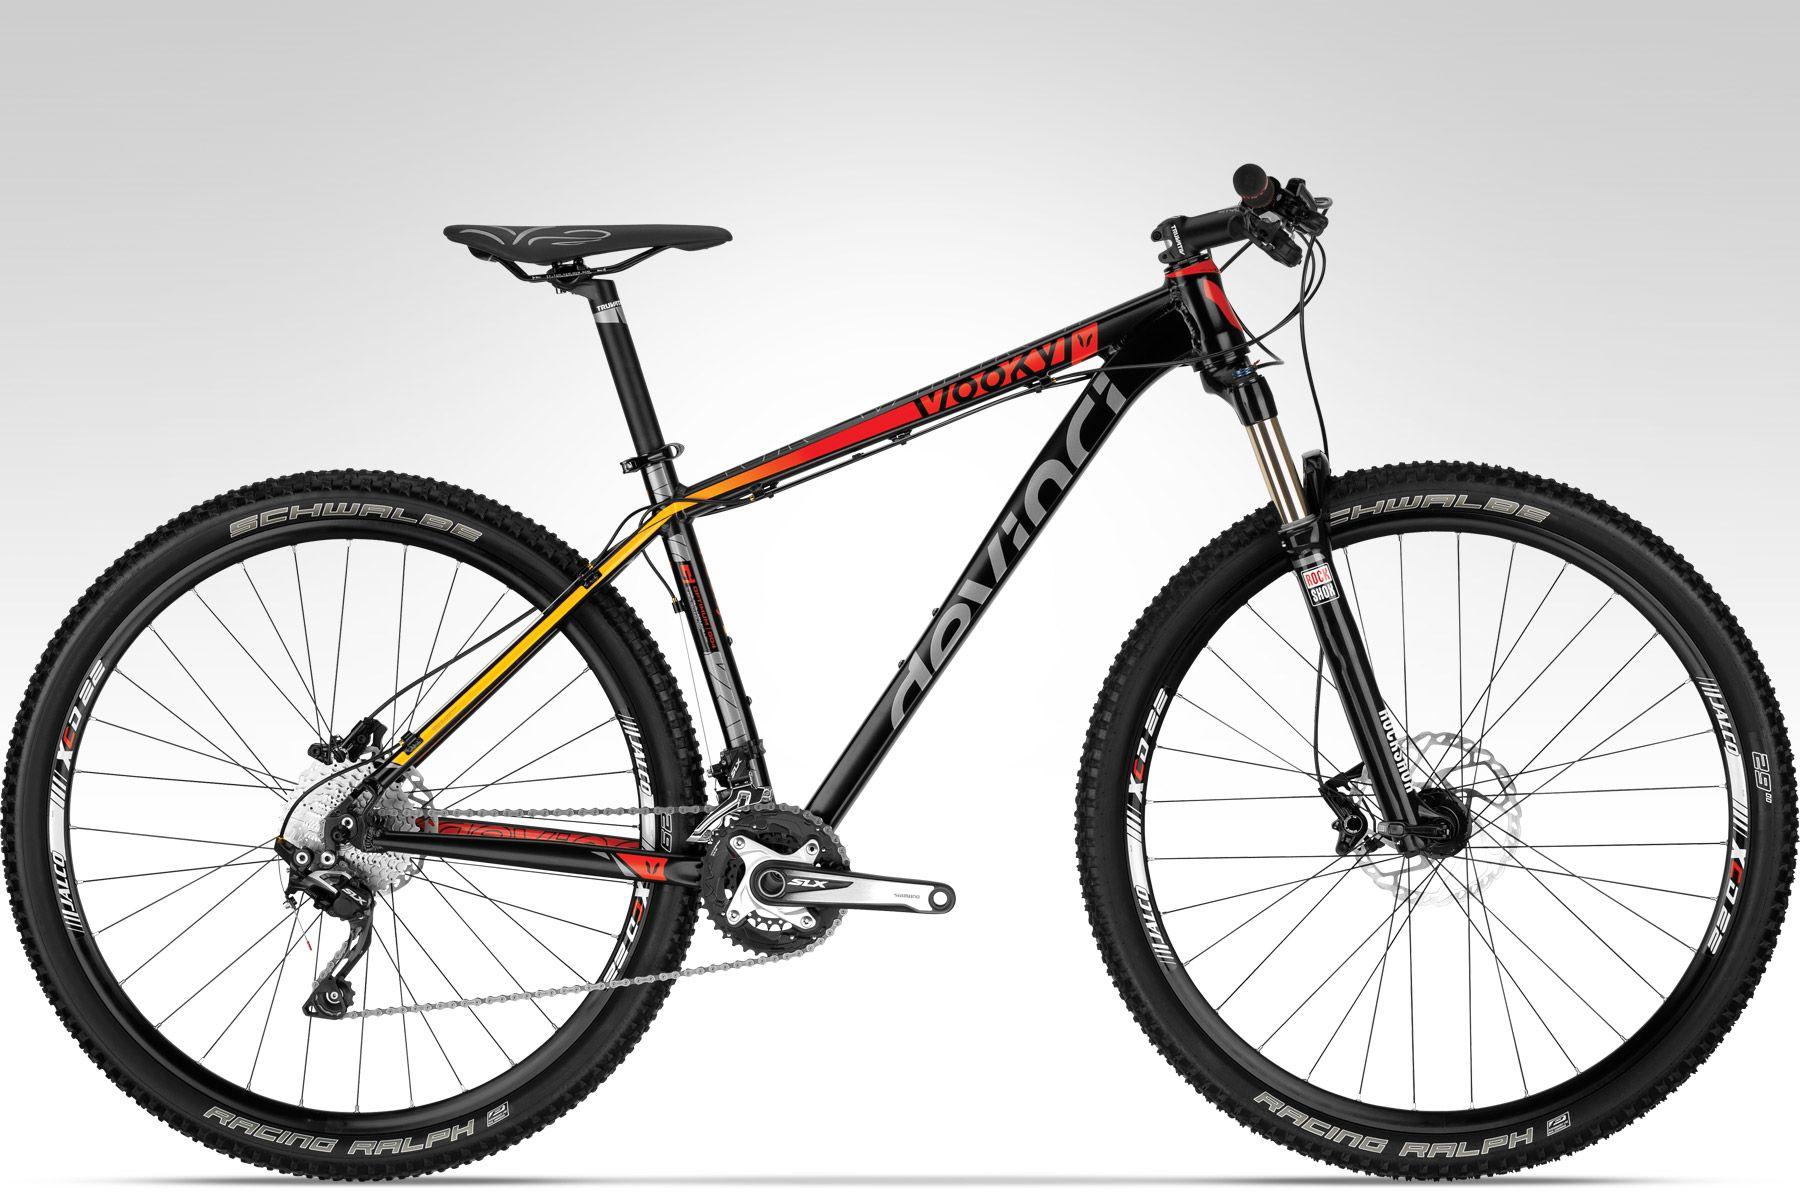 Devinci Wooky Xp Bike Made In Canada Trek Bicycle Cross